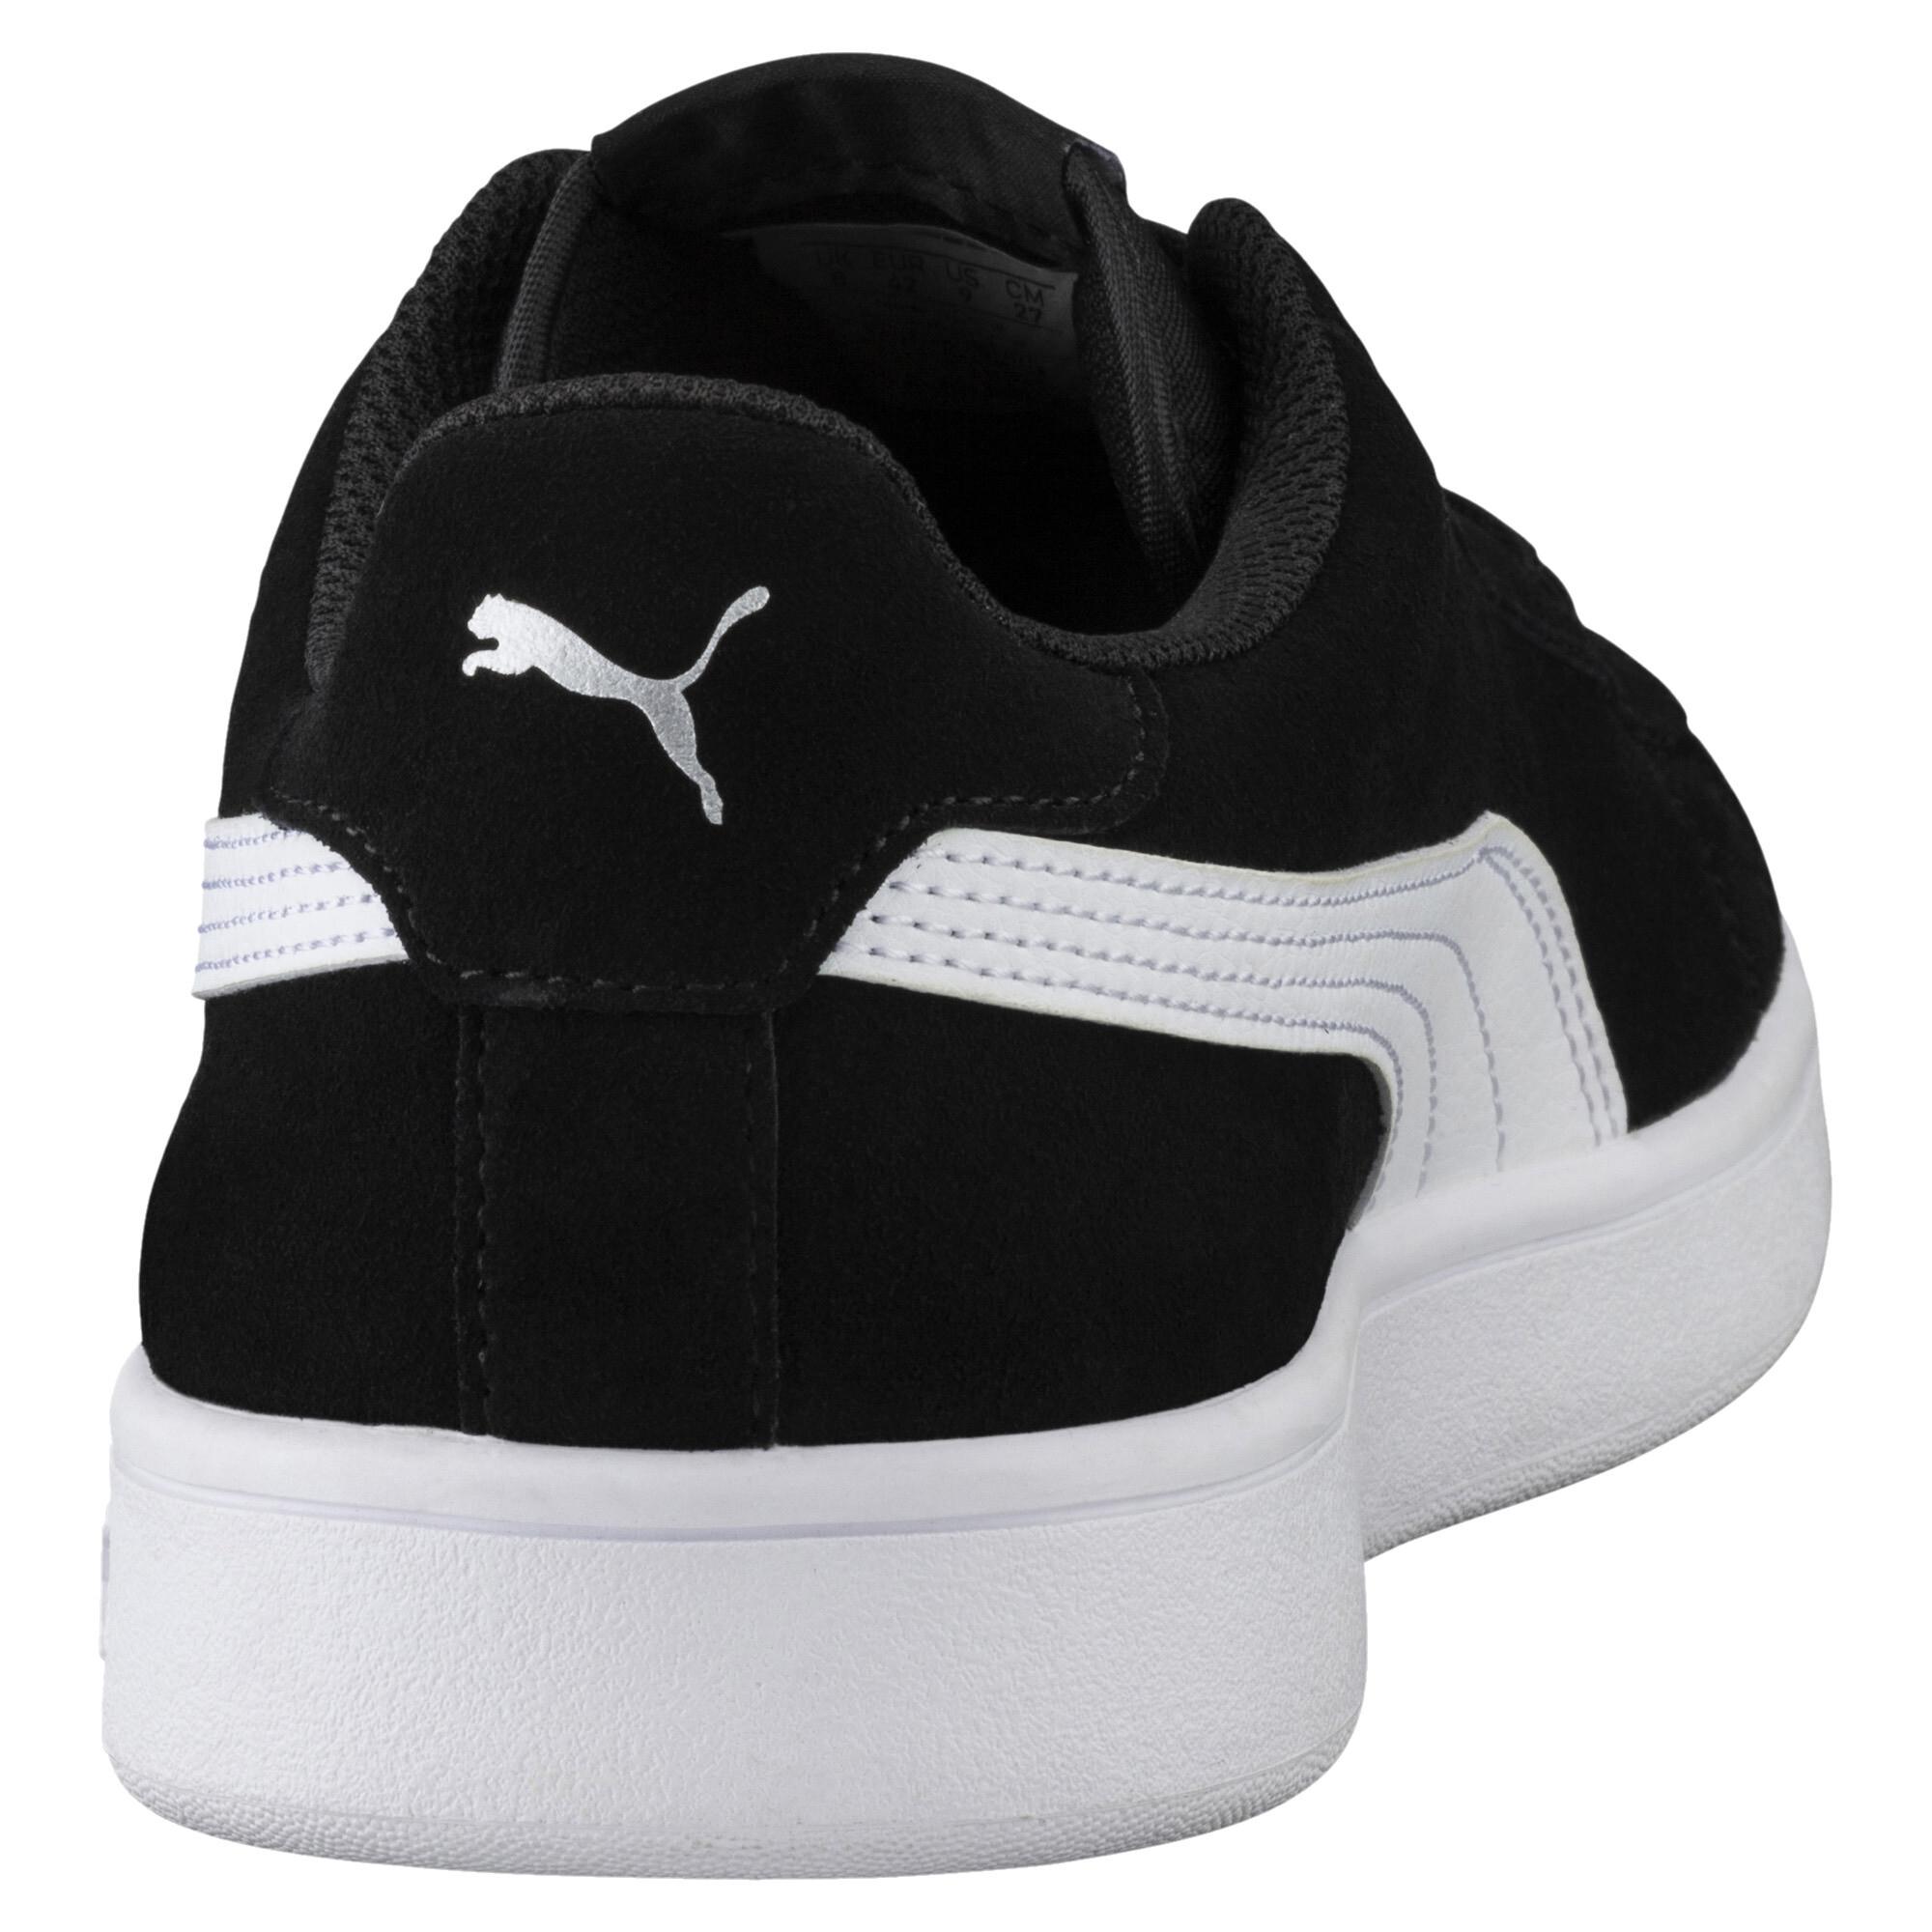 miniature 12 - Puma Men's Smash v2 Sneakers